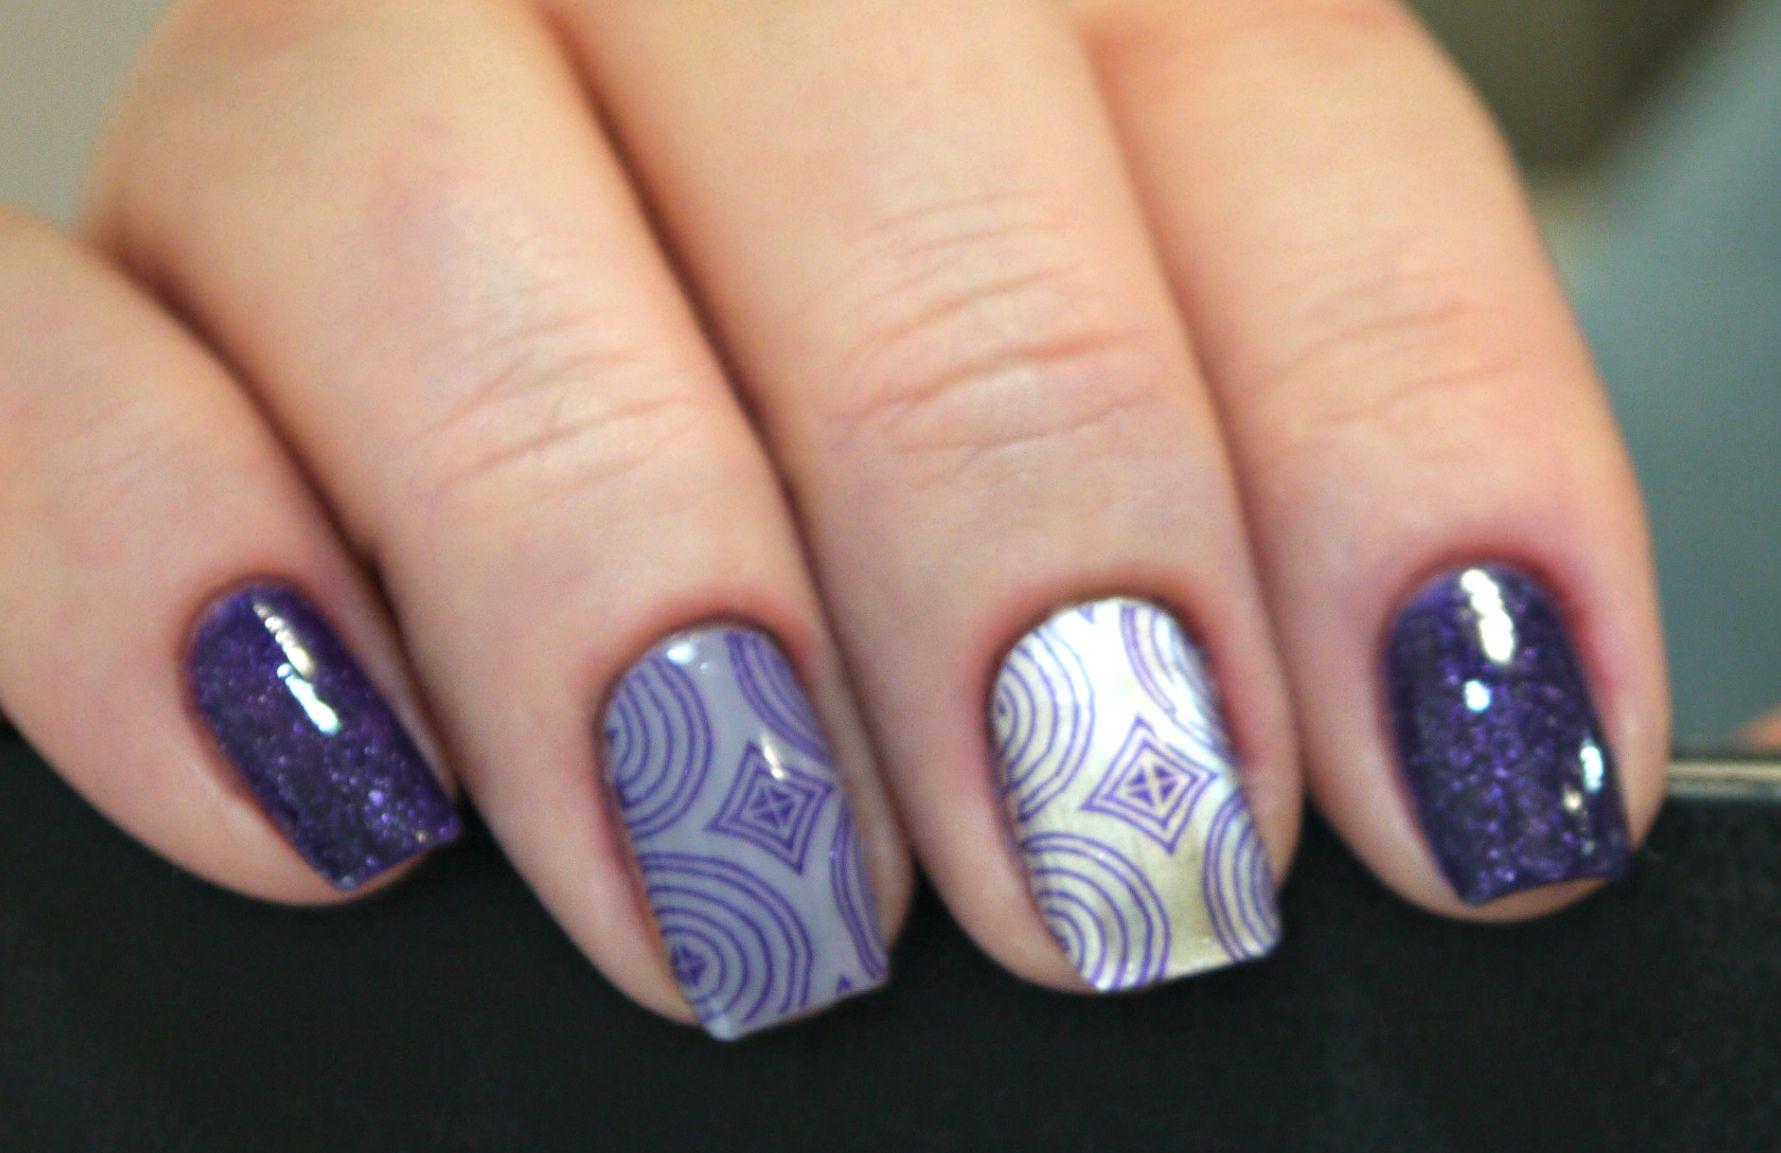 Nail art by Fairy Nail Story | STAMPING BEAUTY | Pinterest | Beauty ...